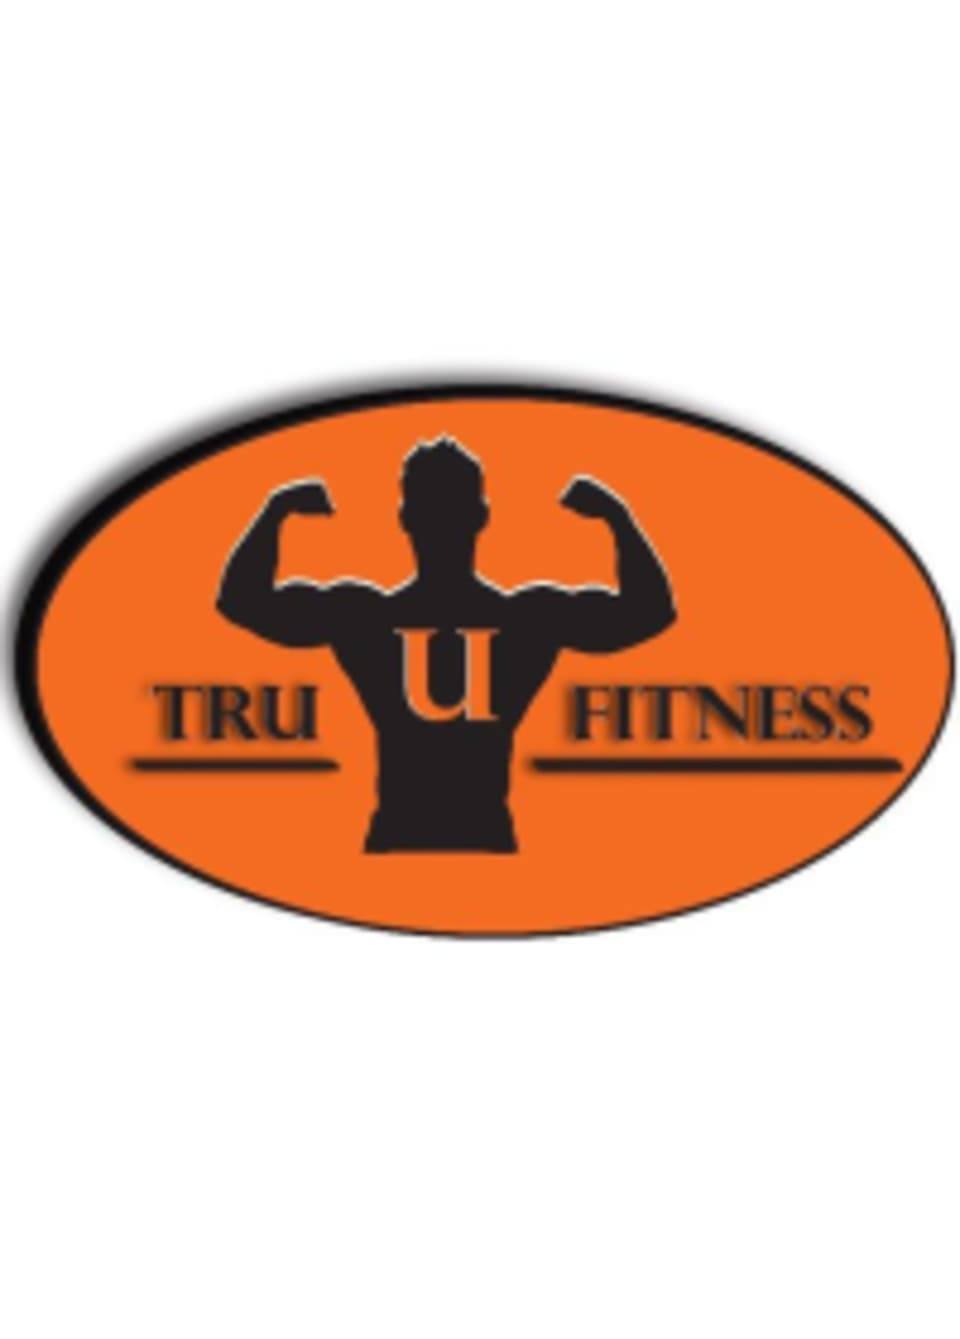 Tru U Fitness logo